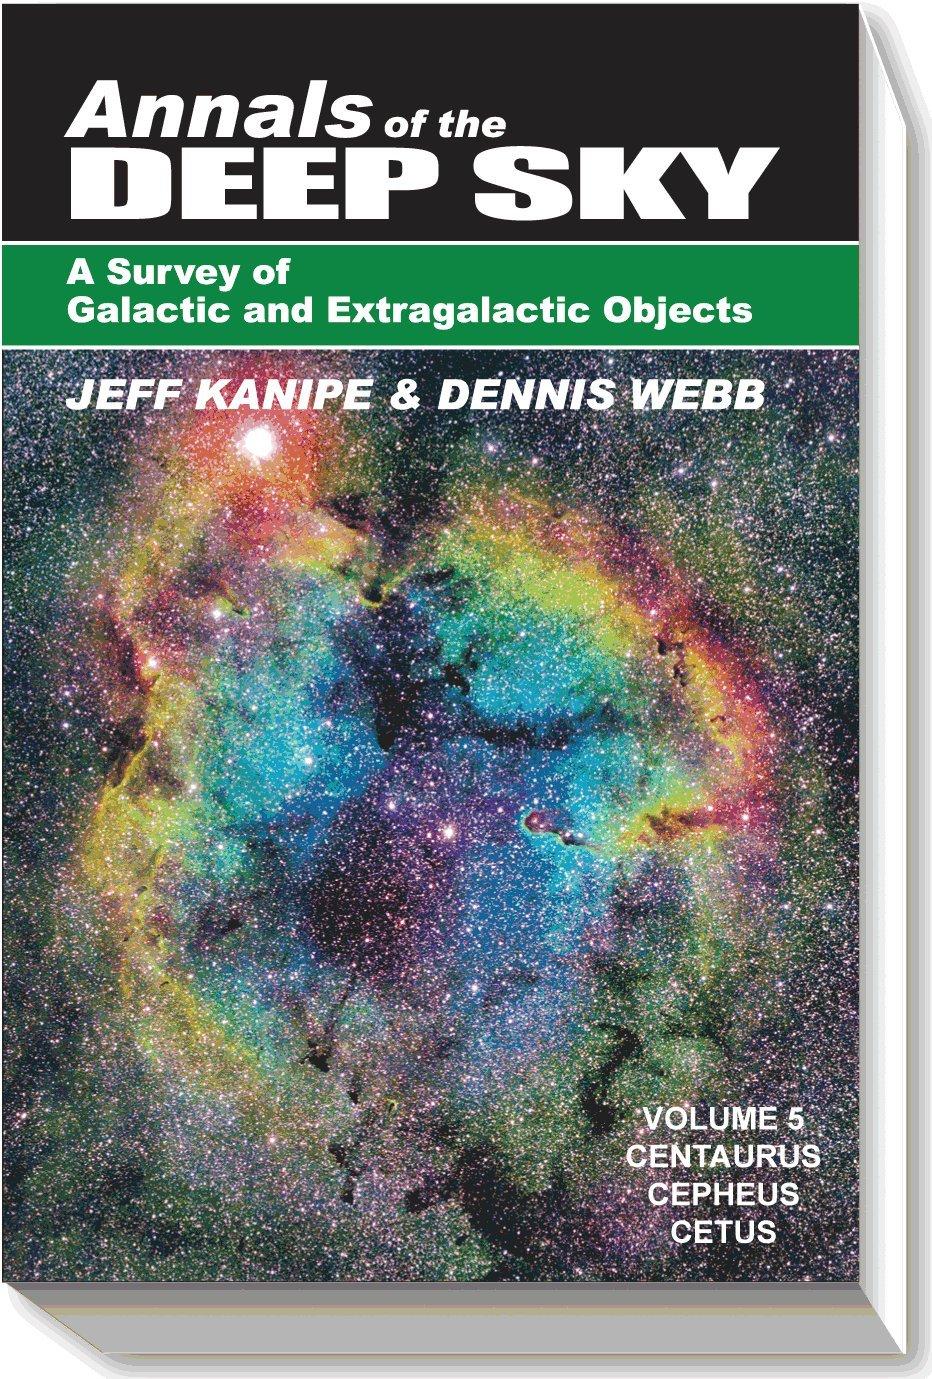 Download Annals of the DEEP SKY, Volume 5 ebook